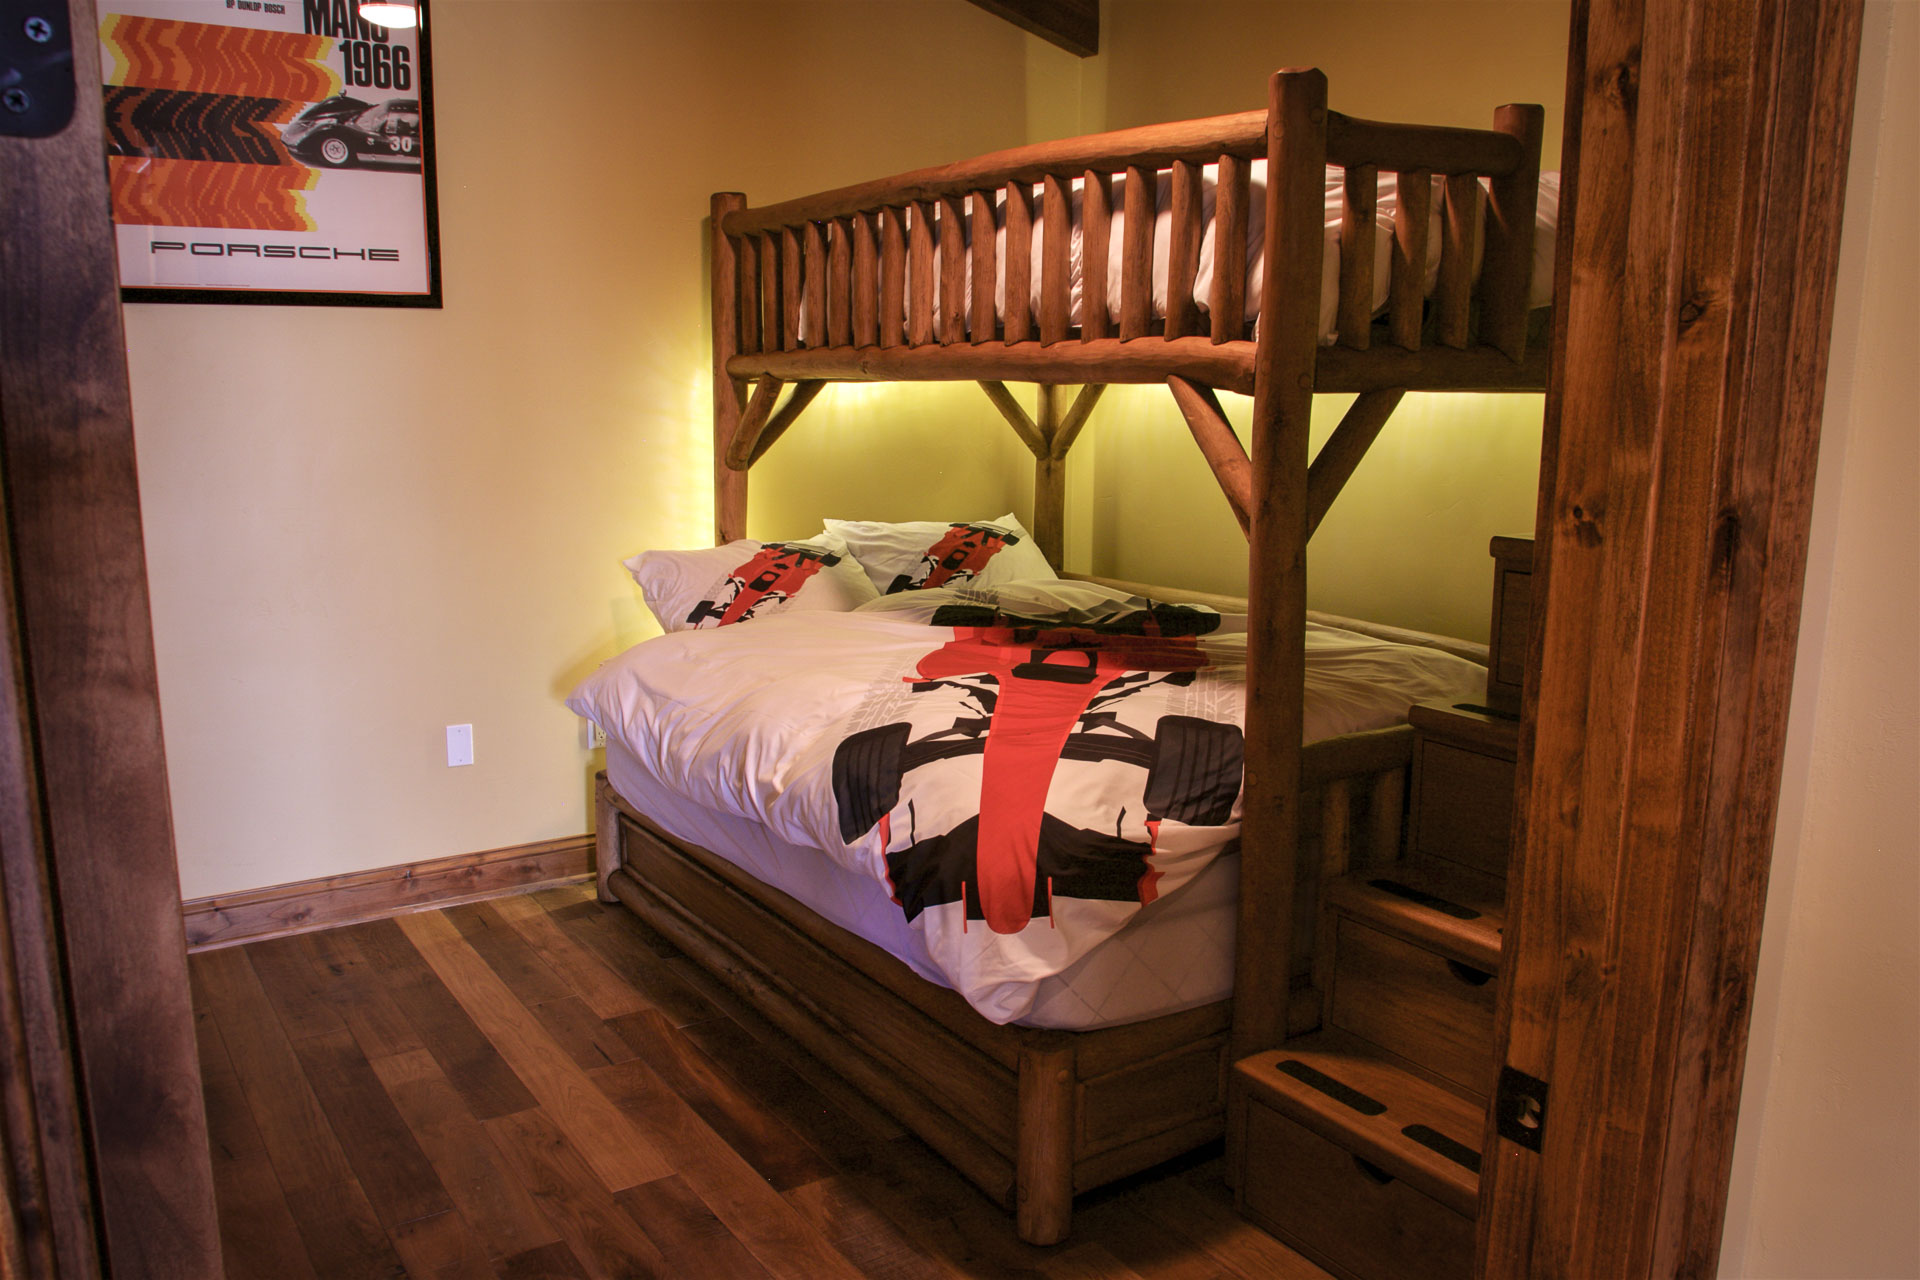 Maranello  Additional Guest Bedroom   Sleeps 3-5   Bunk-Trundle Bed